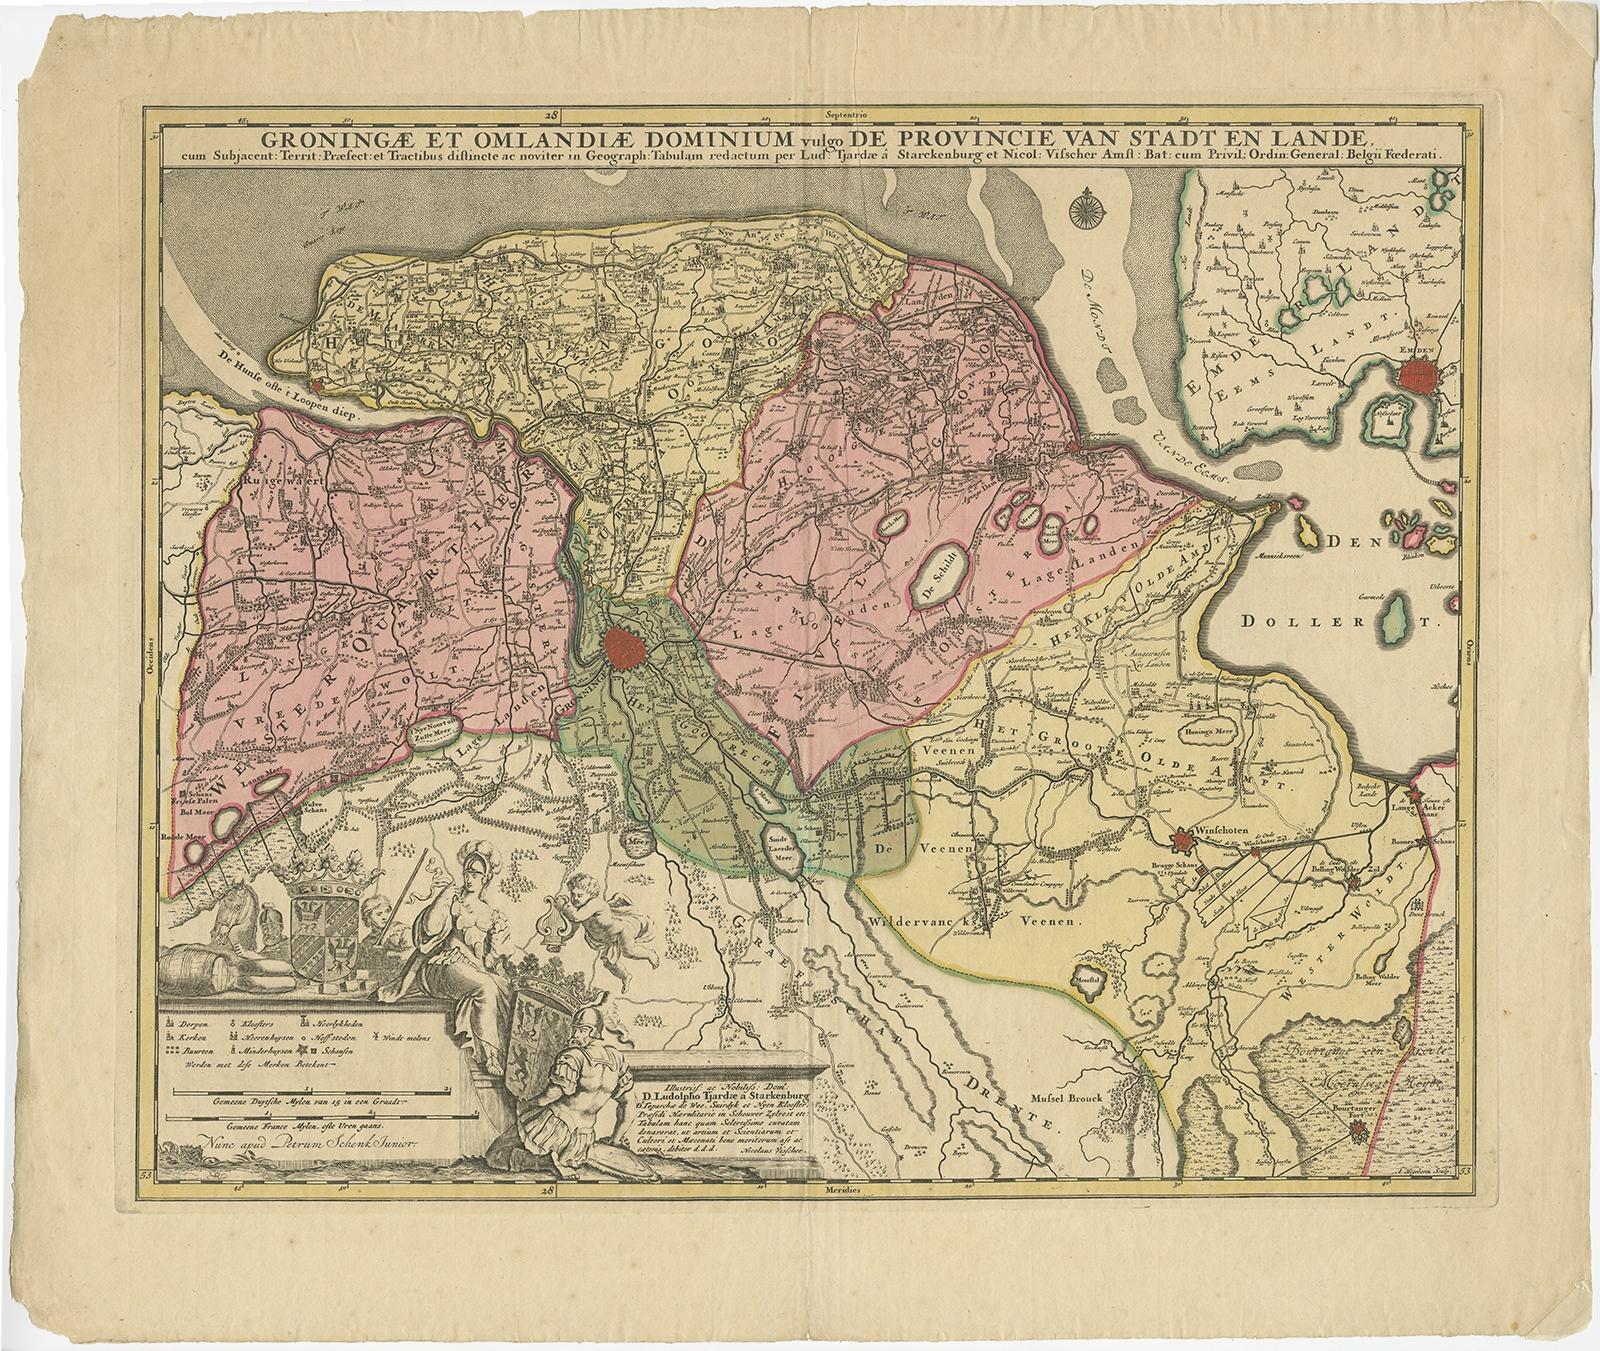 Antique Map of Groningen by Schenk (c.1700)